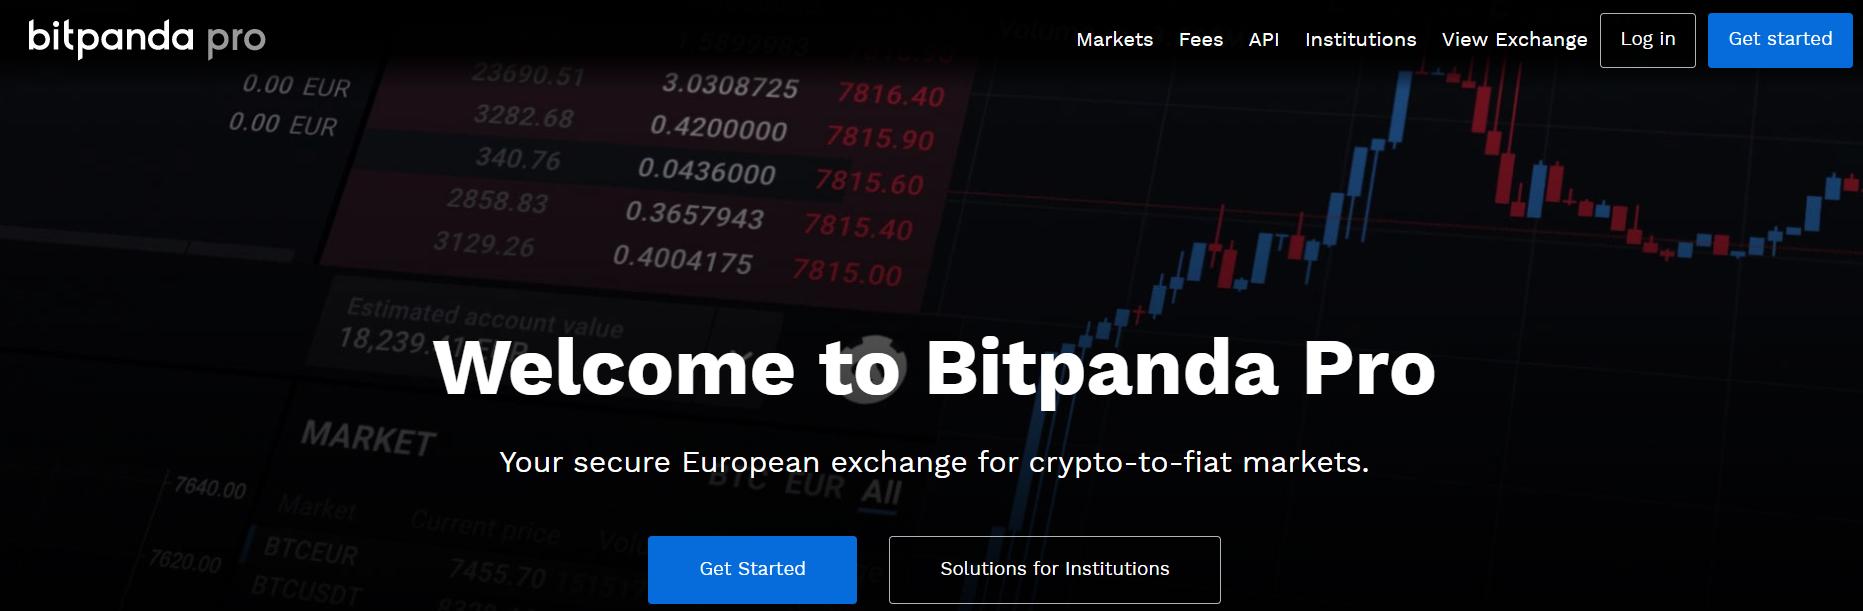 Bitpanda Pro recenze